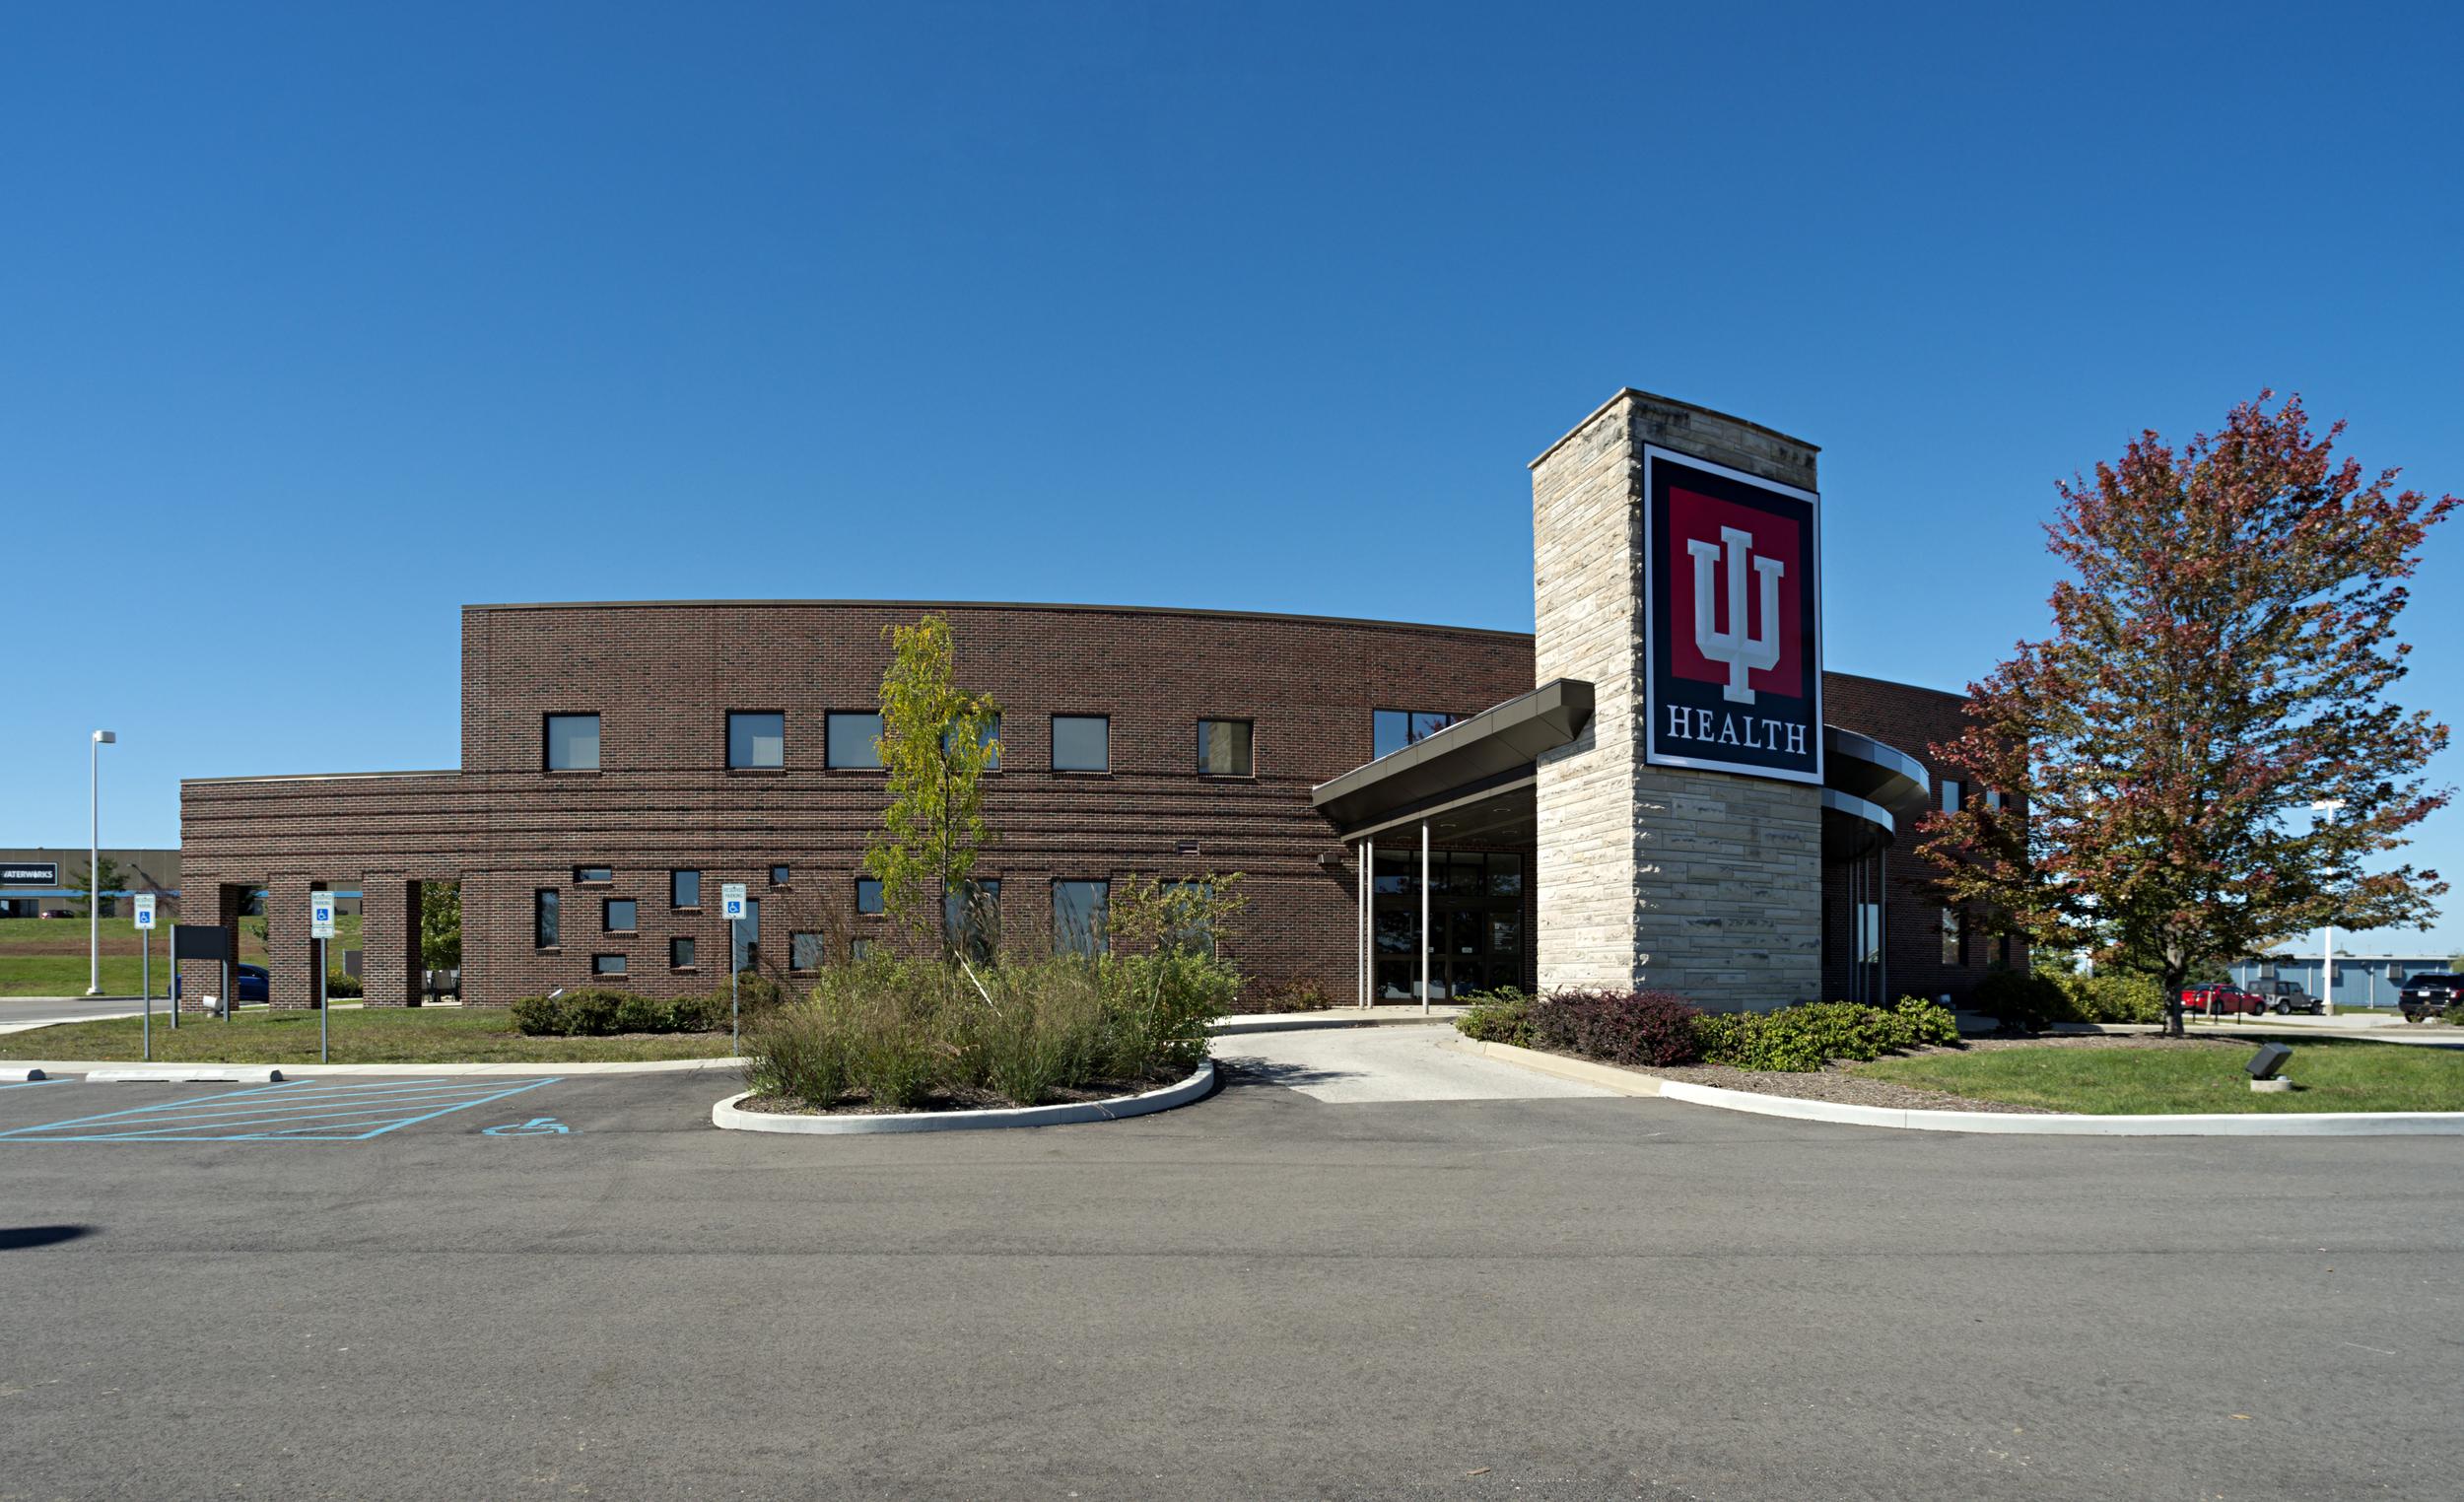 IU Health - Liberty Drive, Bloomington